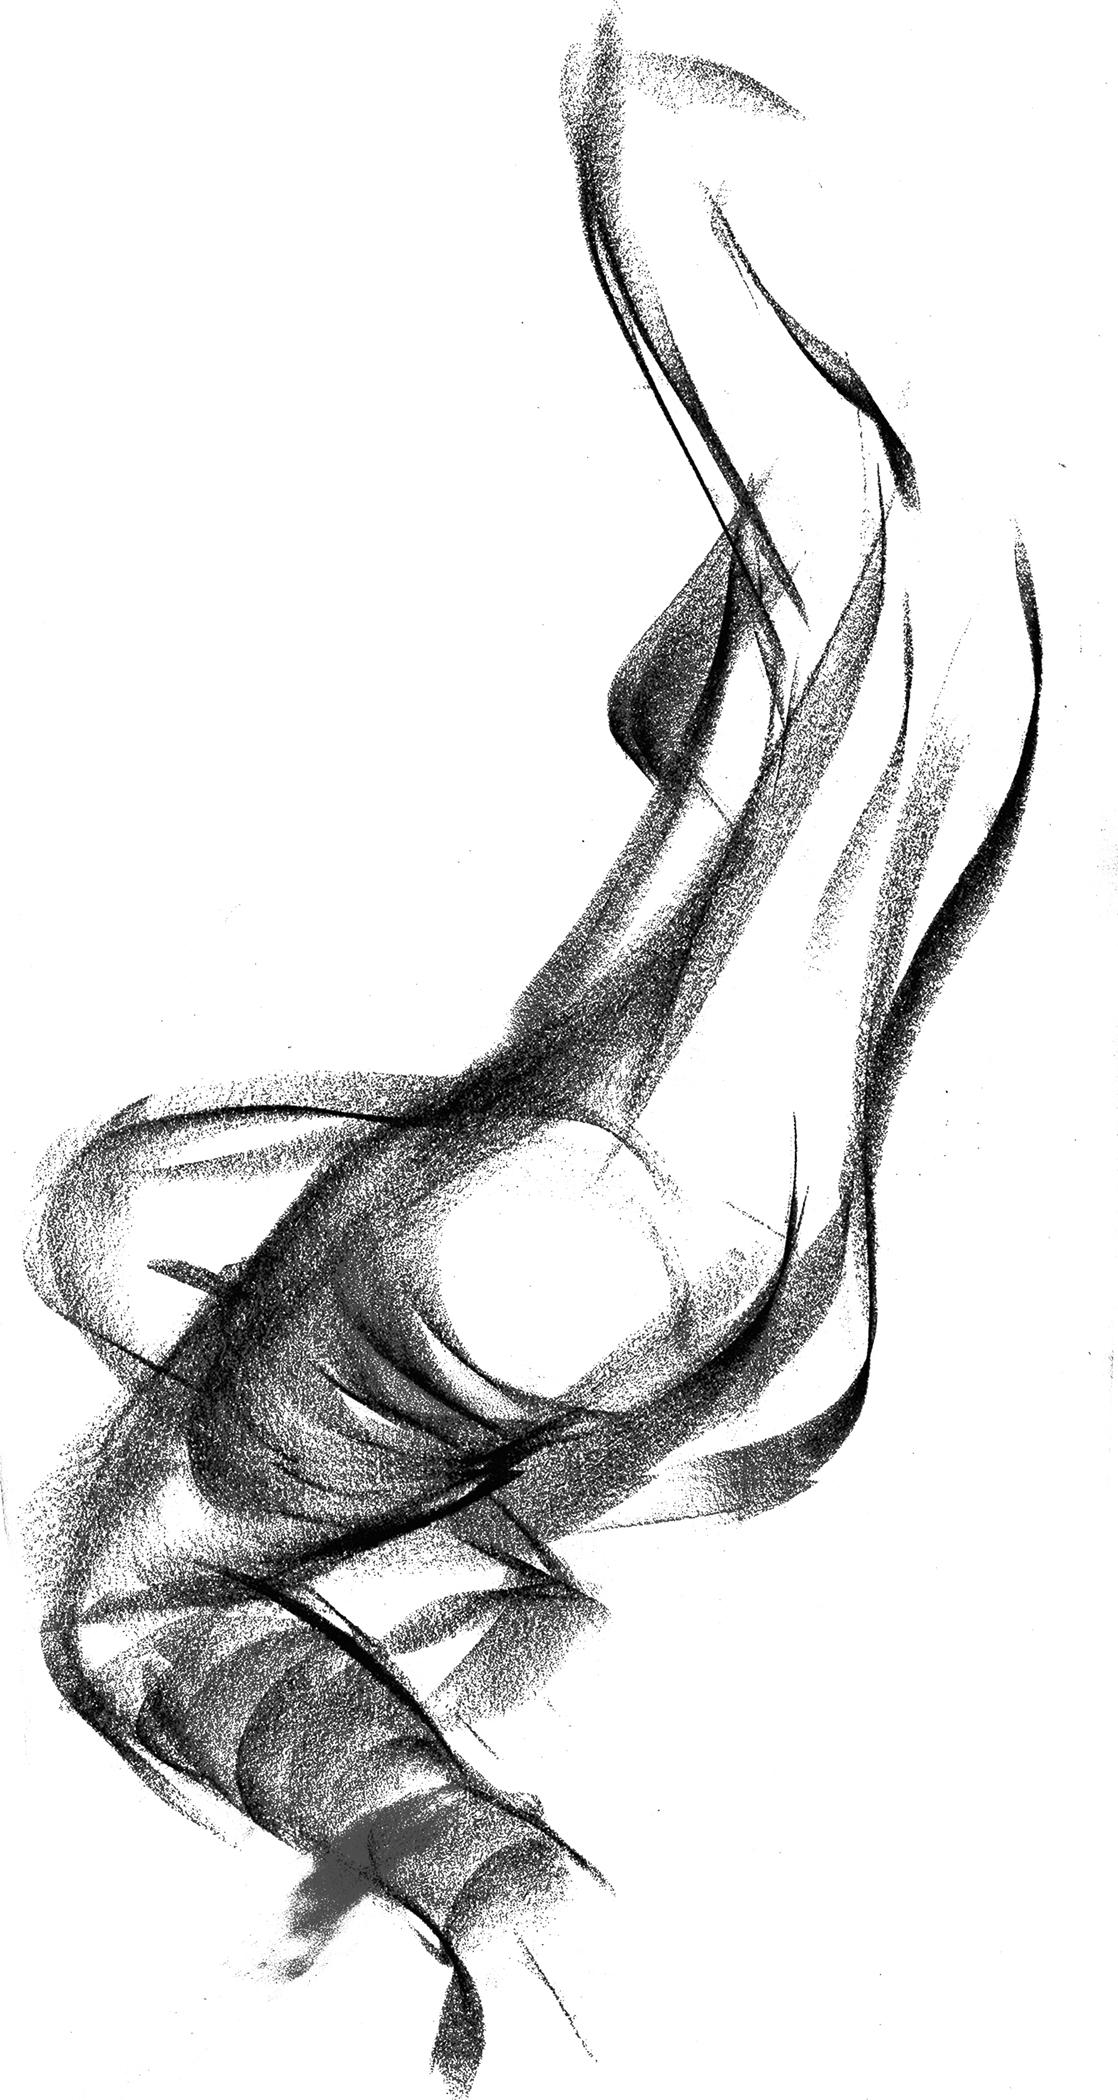 human_figure_charcoal.jpg